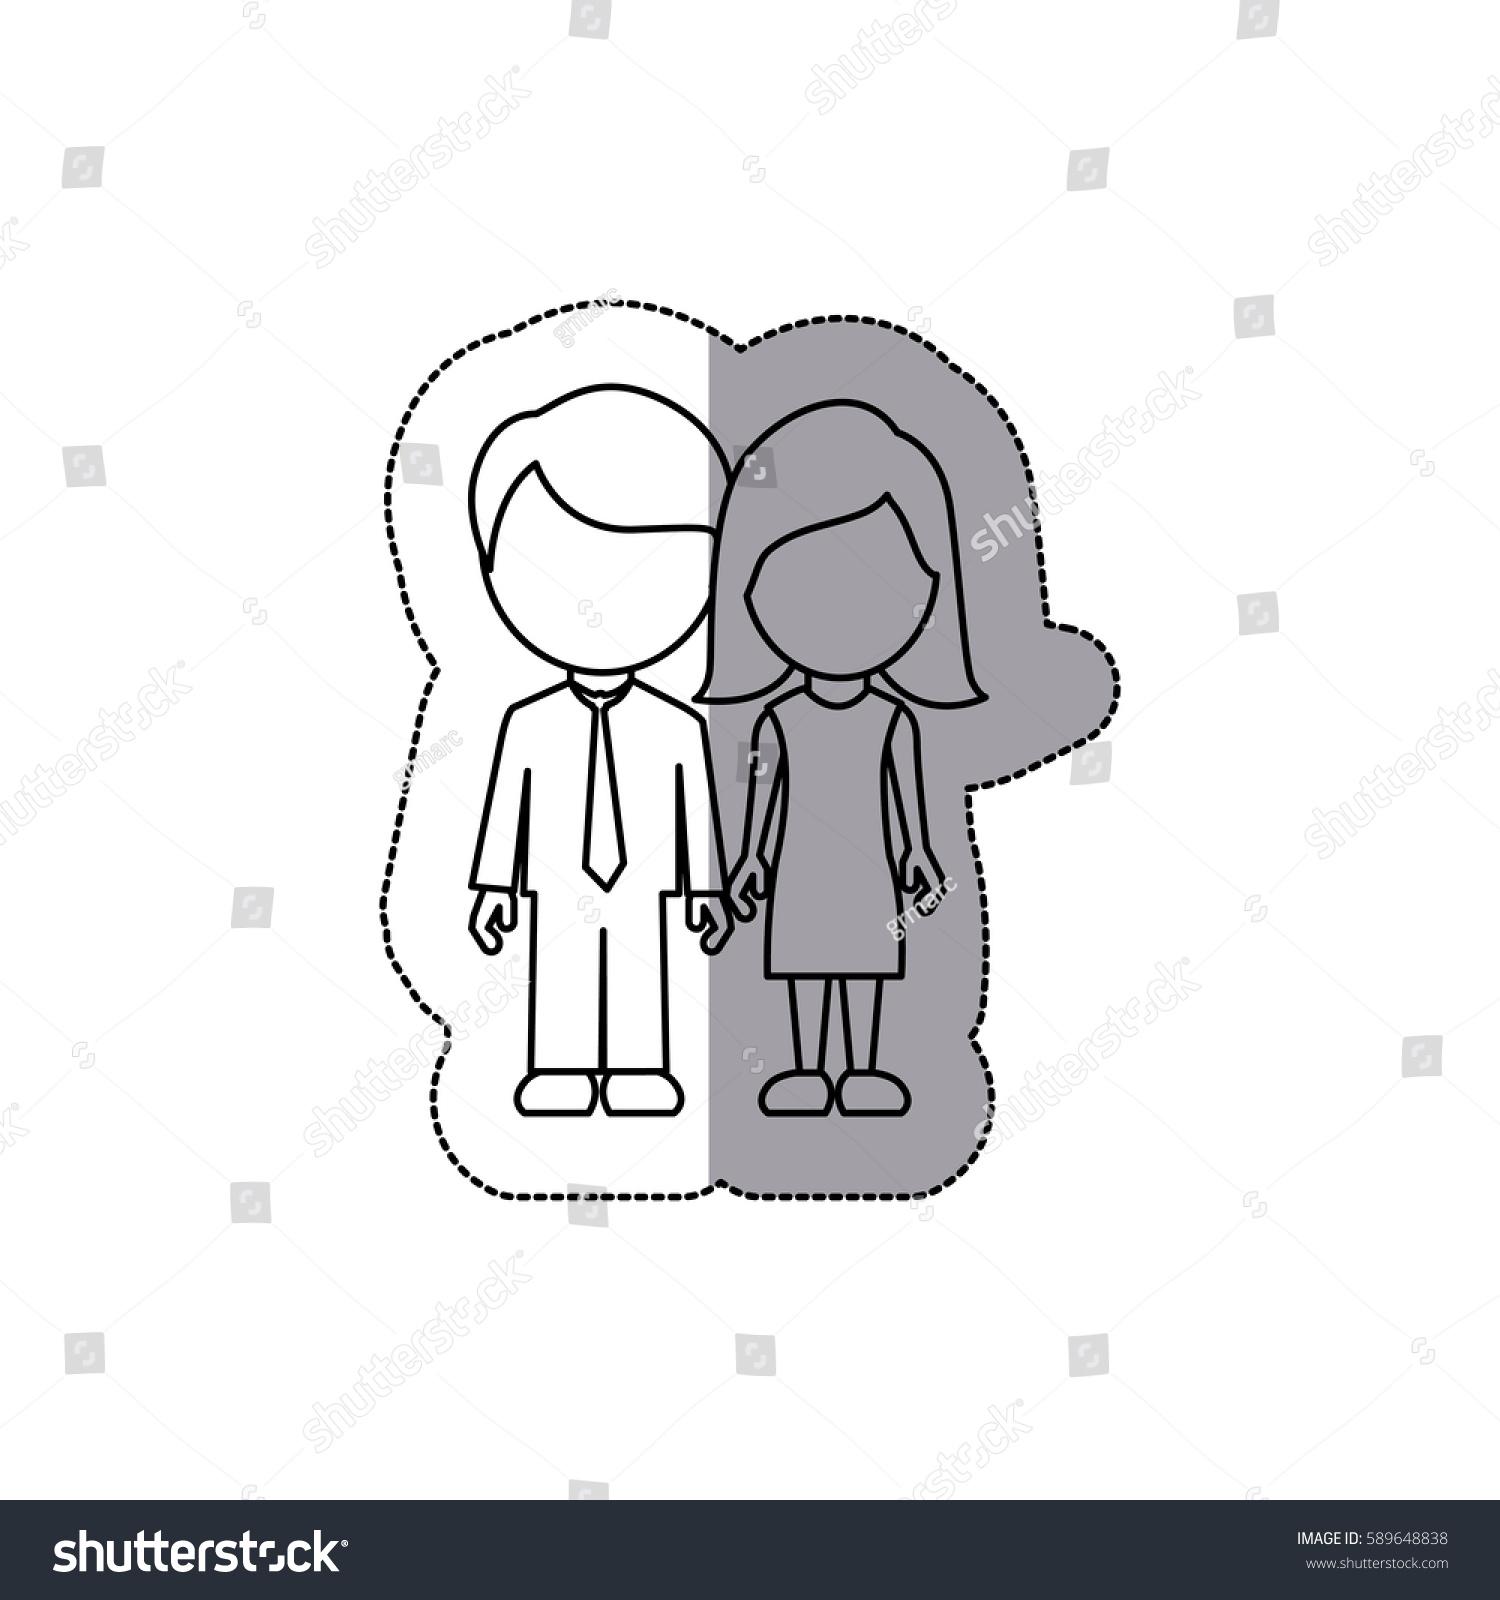 Silhouette Couple Sticker Icon Vector Illustraction Stock Vector ... for Couple Sticker Line  110ylc